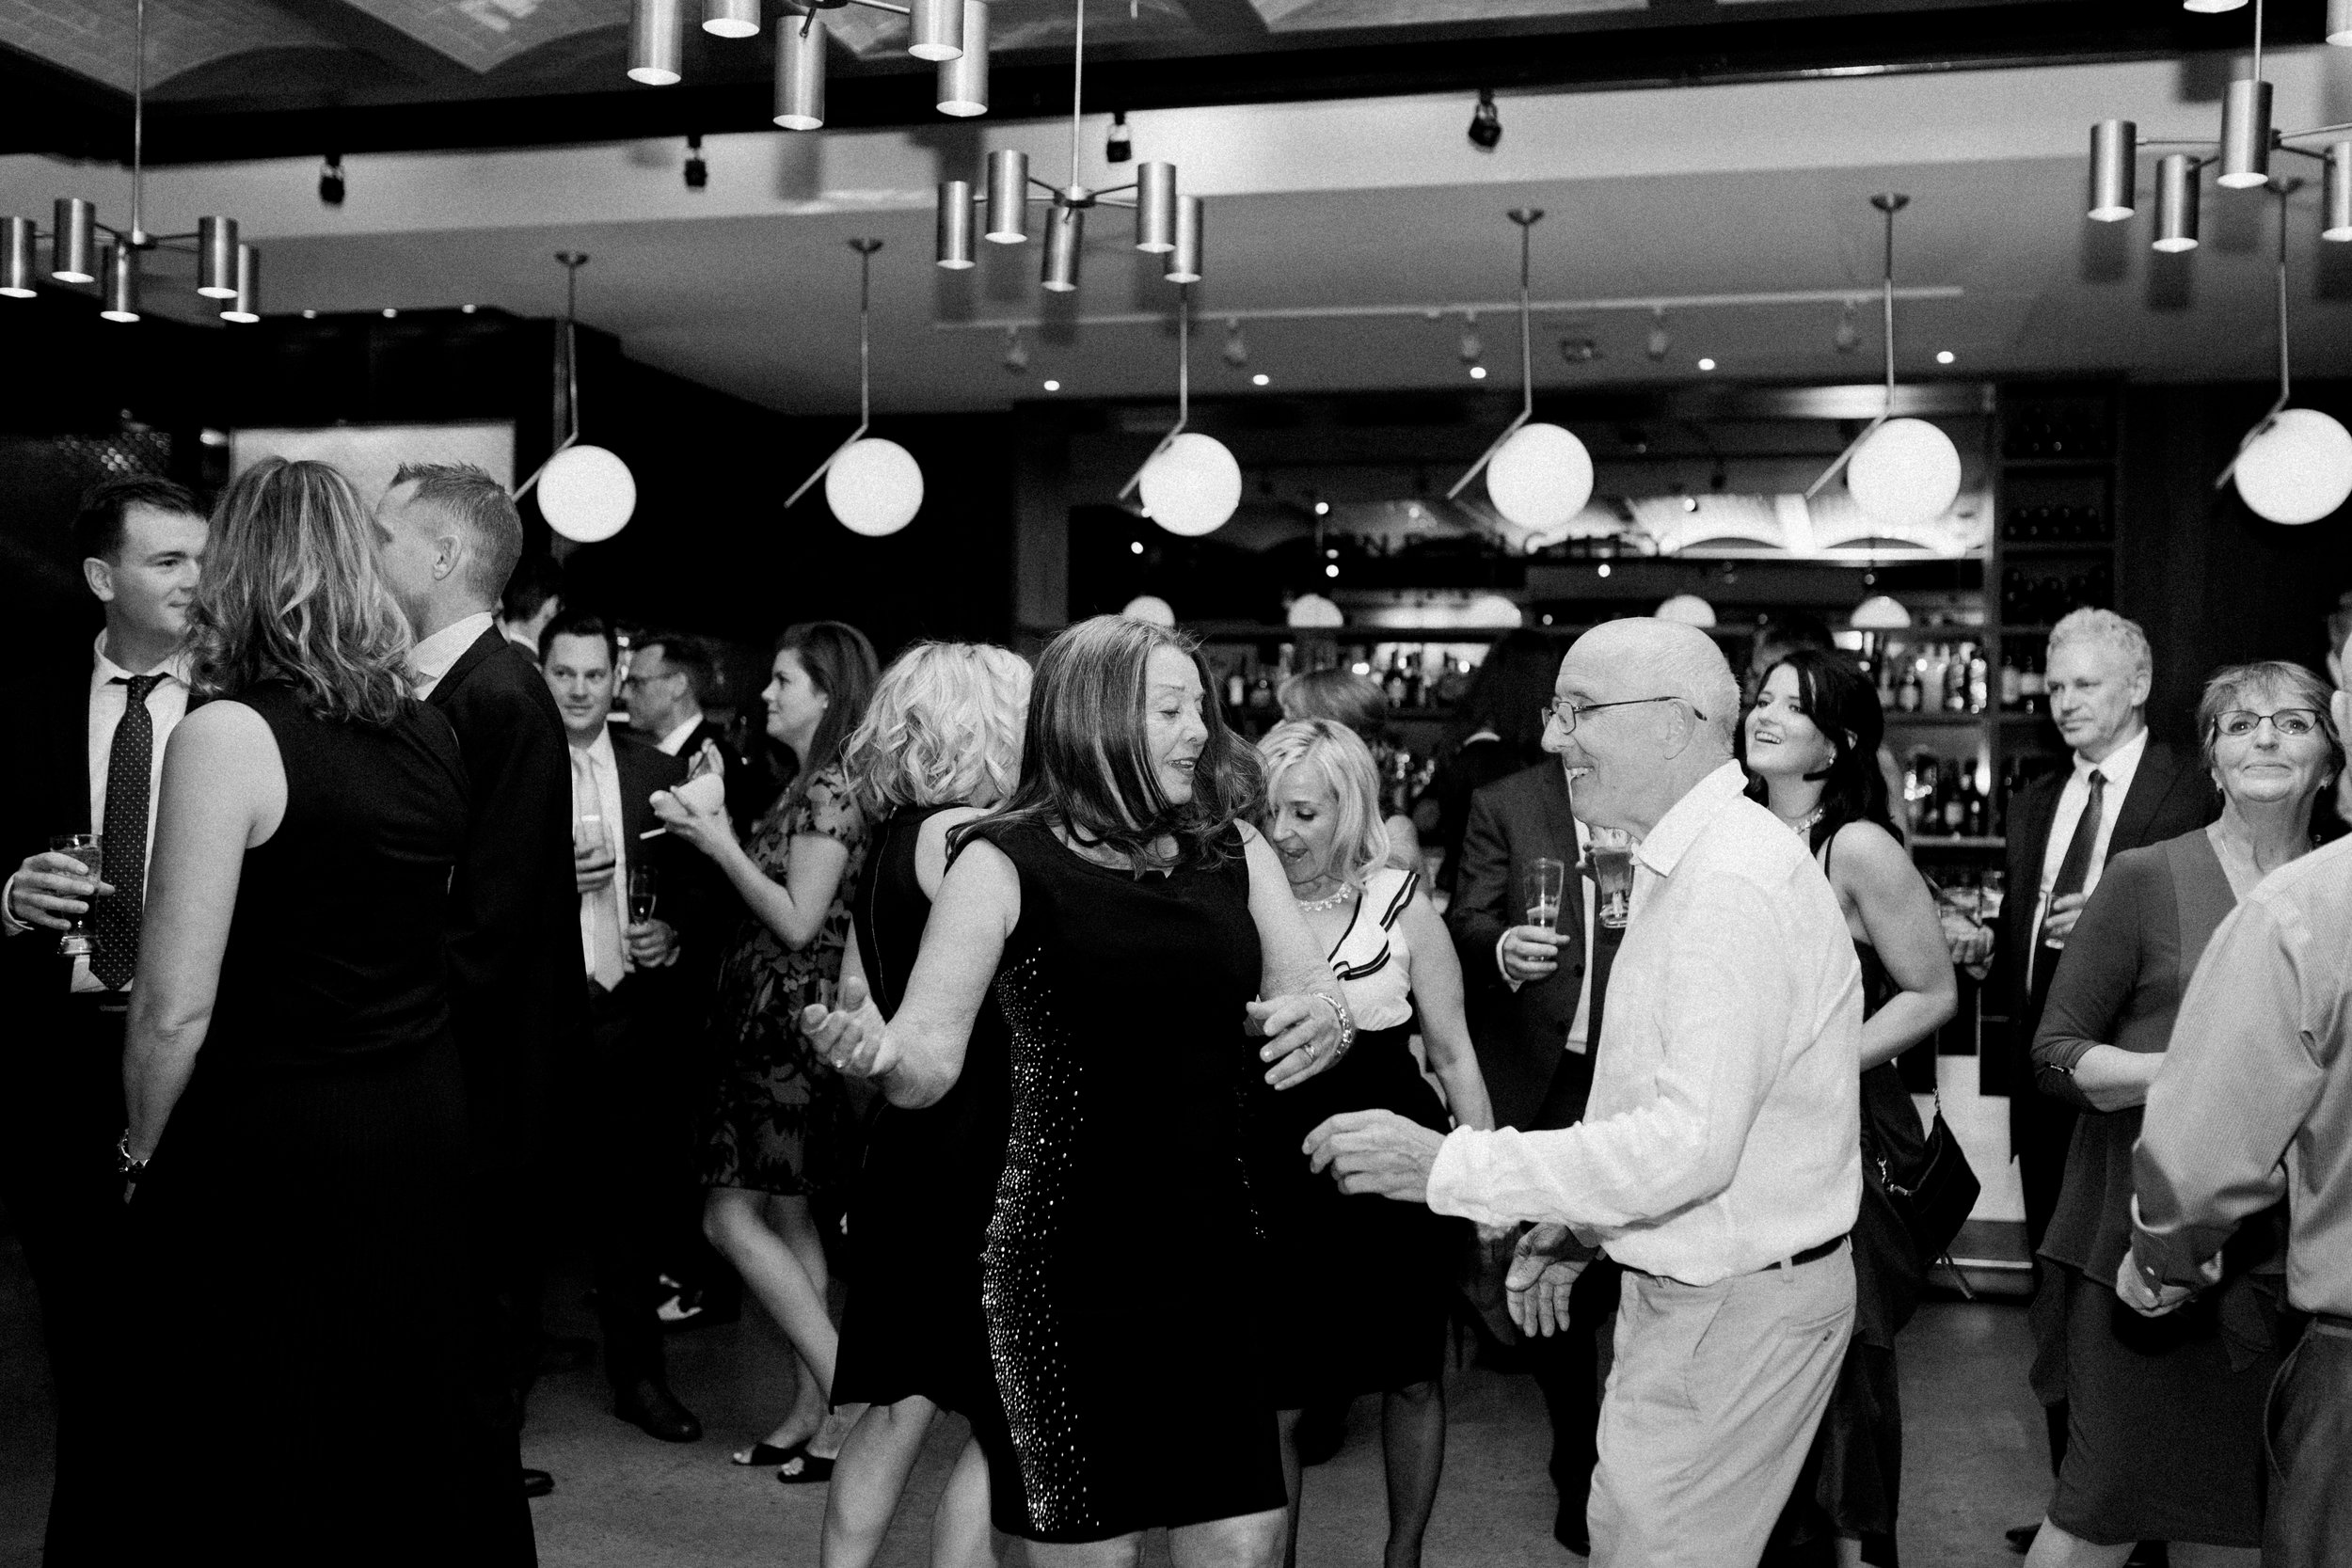 Toronto Fine Art Photographer - 180 Restaurant Wedding - Reception-183.jpg